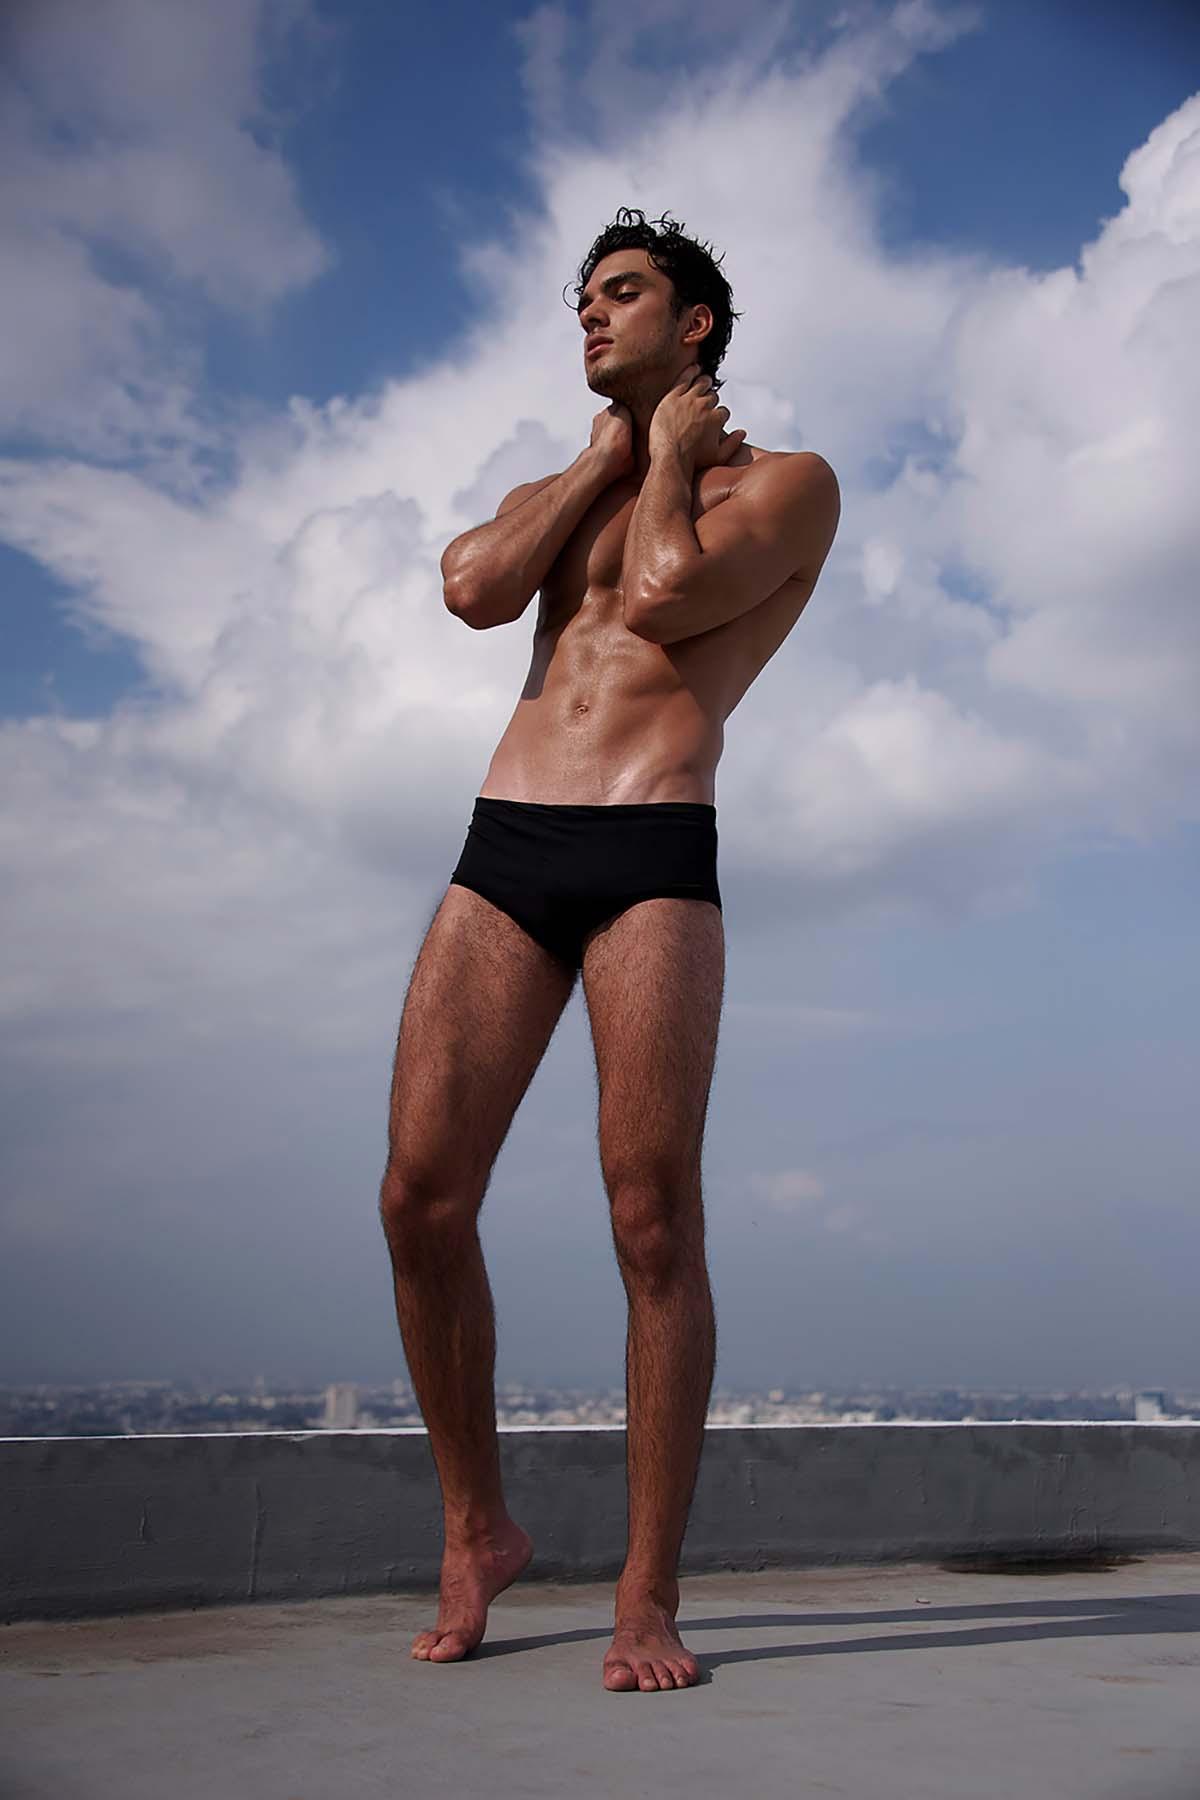 Lucas Rufino by Phatchon Jankong for Brazilian Male Model